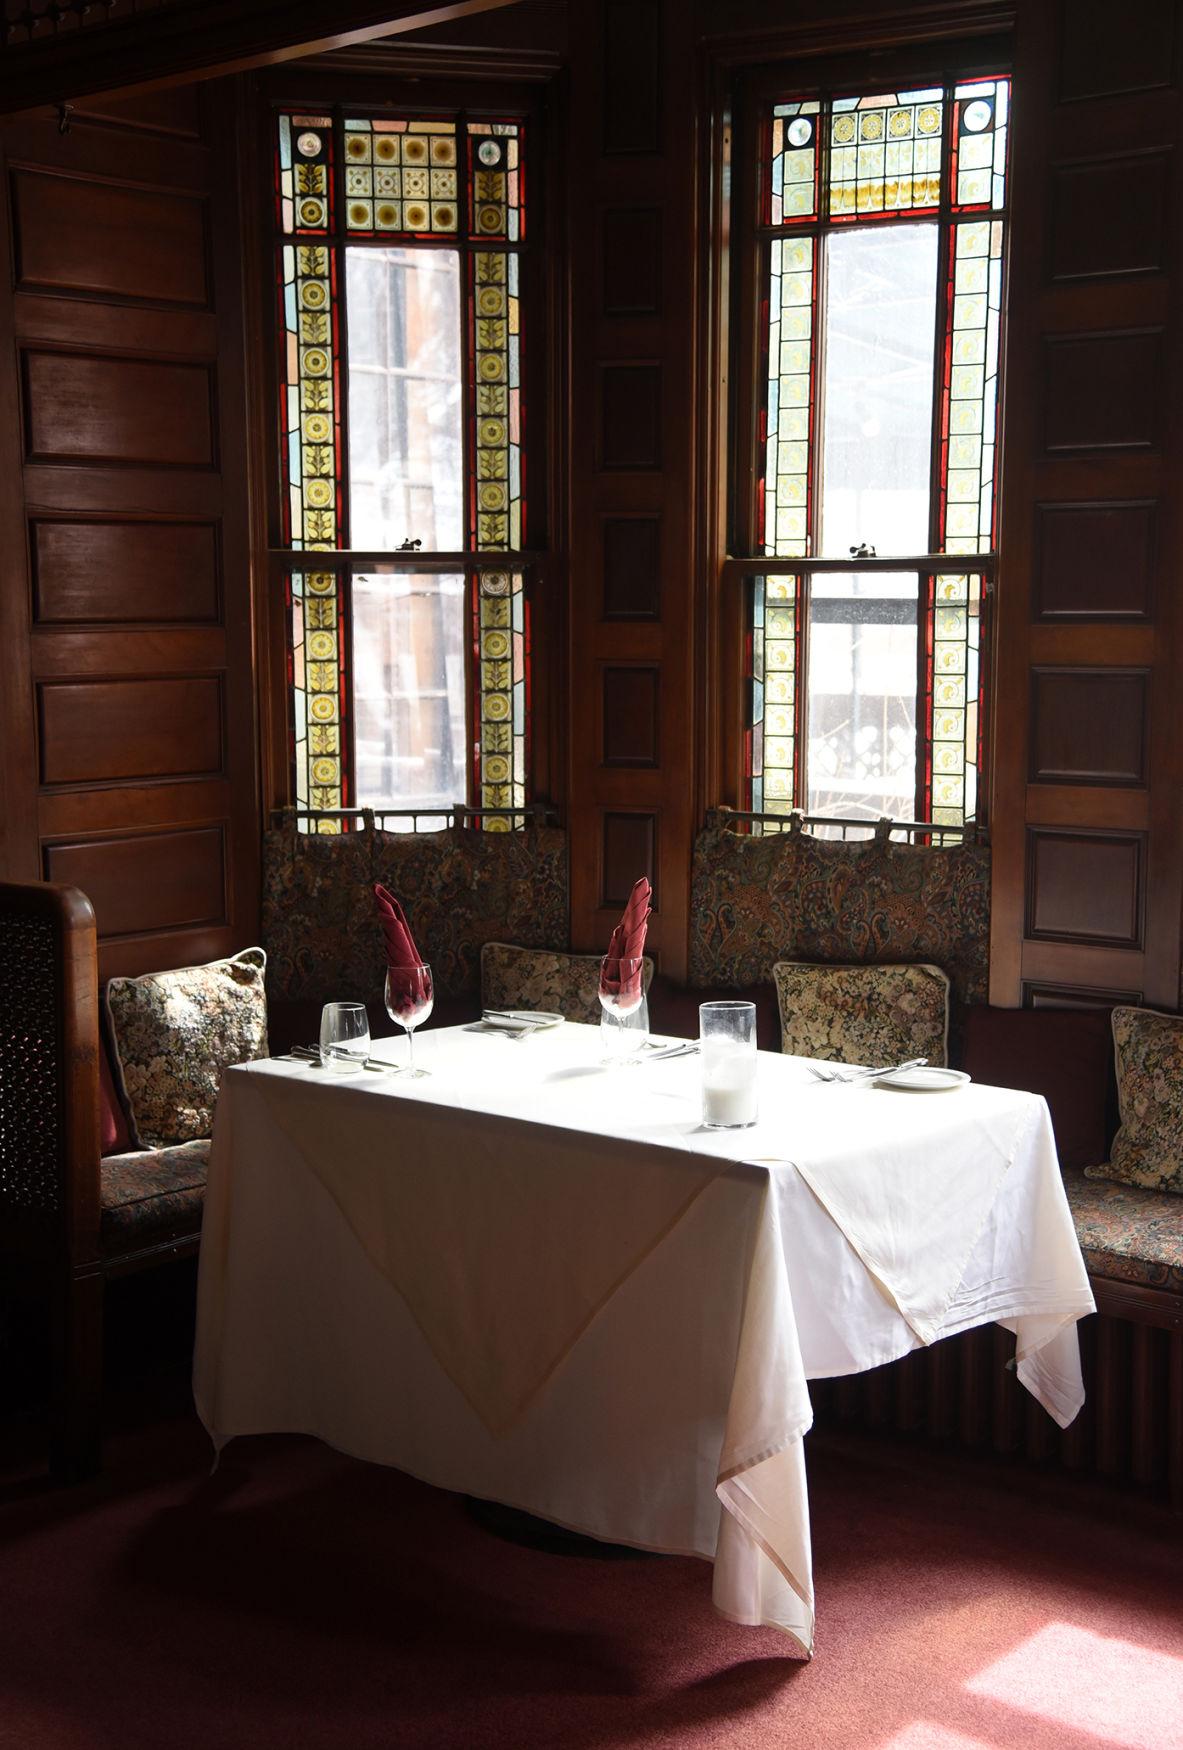 Briarhurst Manor Restaurant